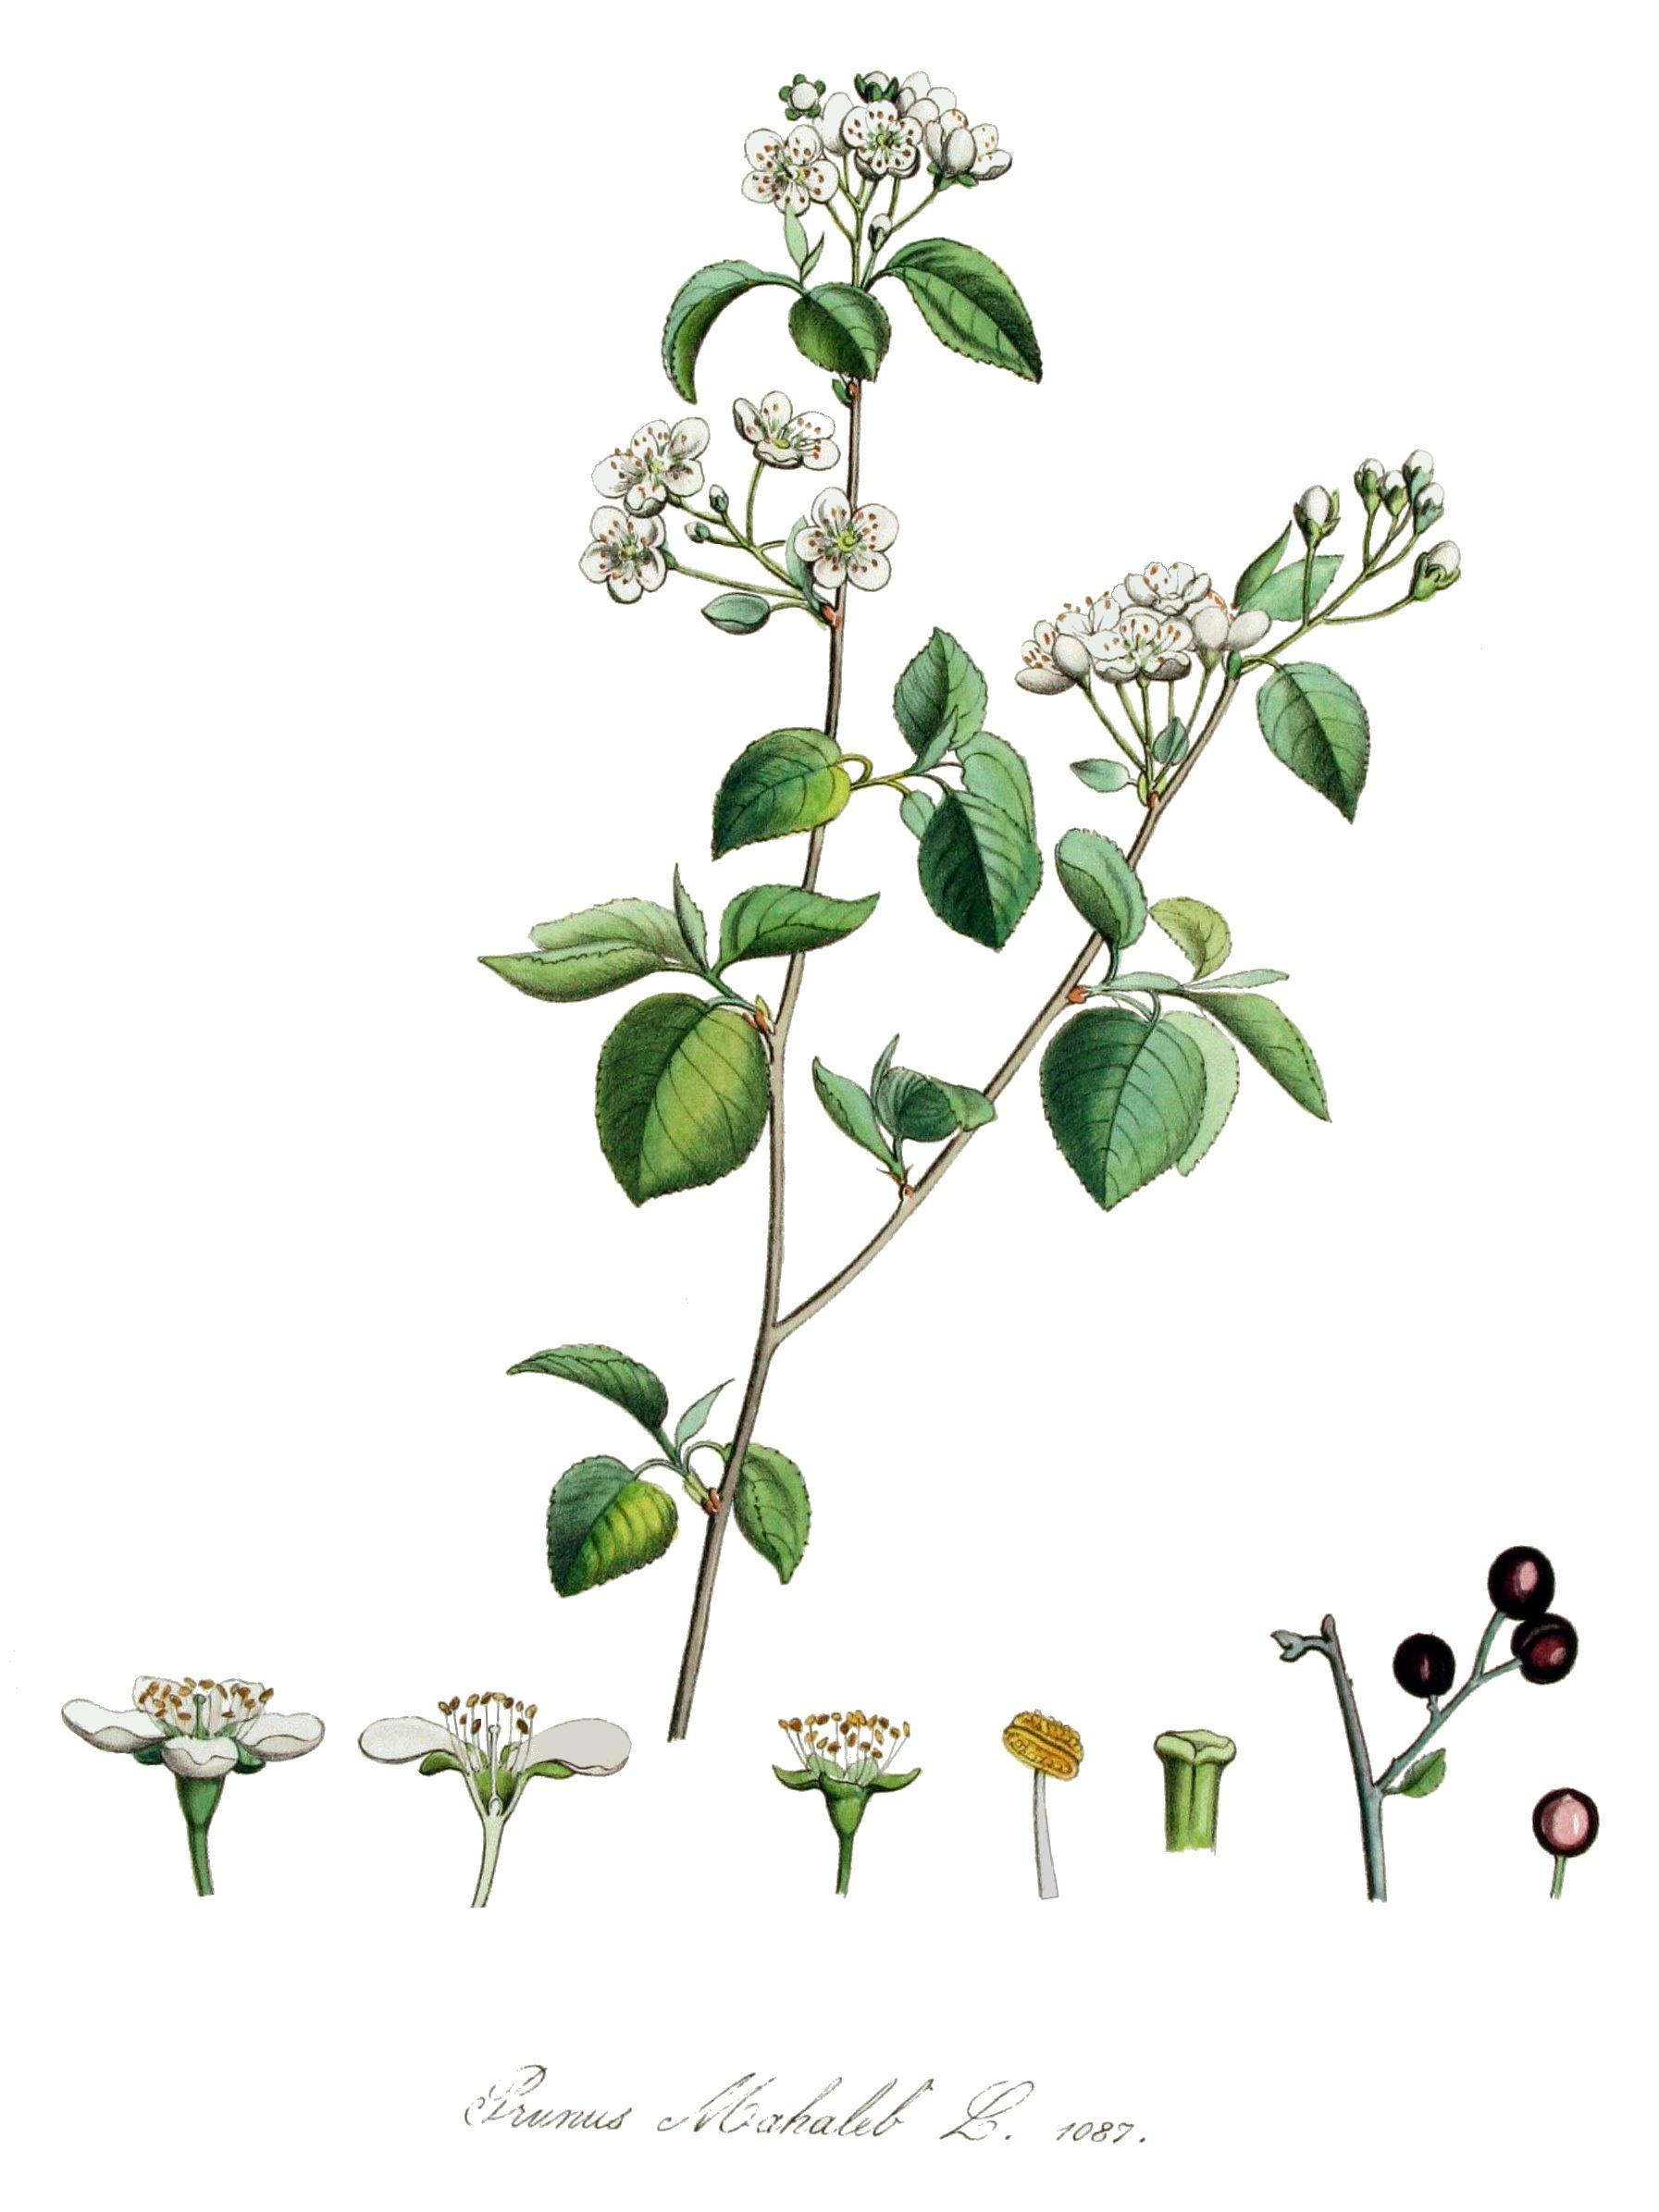 Prunus_mahaleb_fonte wikipedia commons